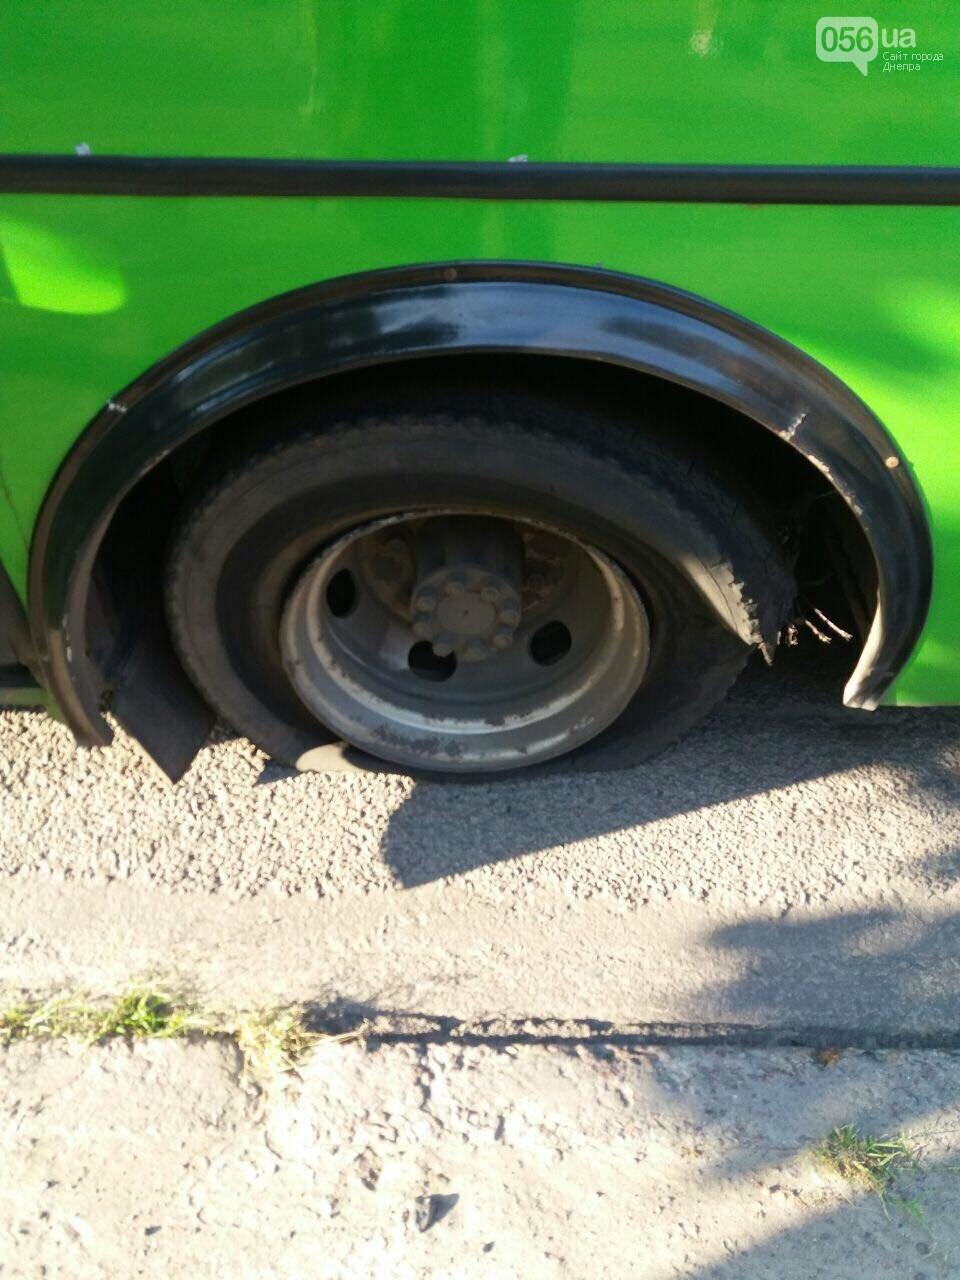 В Днепре на ходу маршрутка осталась без задних колес: что произошло, - ФОТО, фото-1